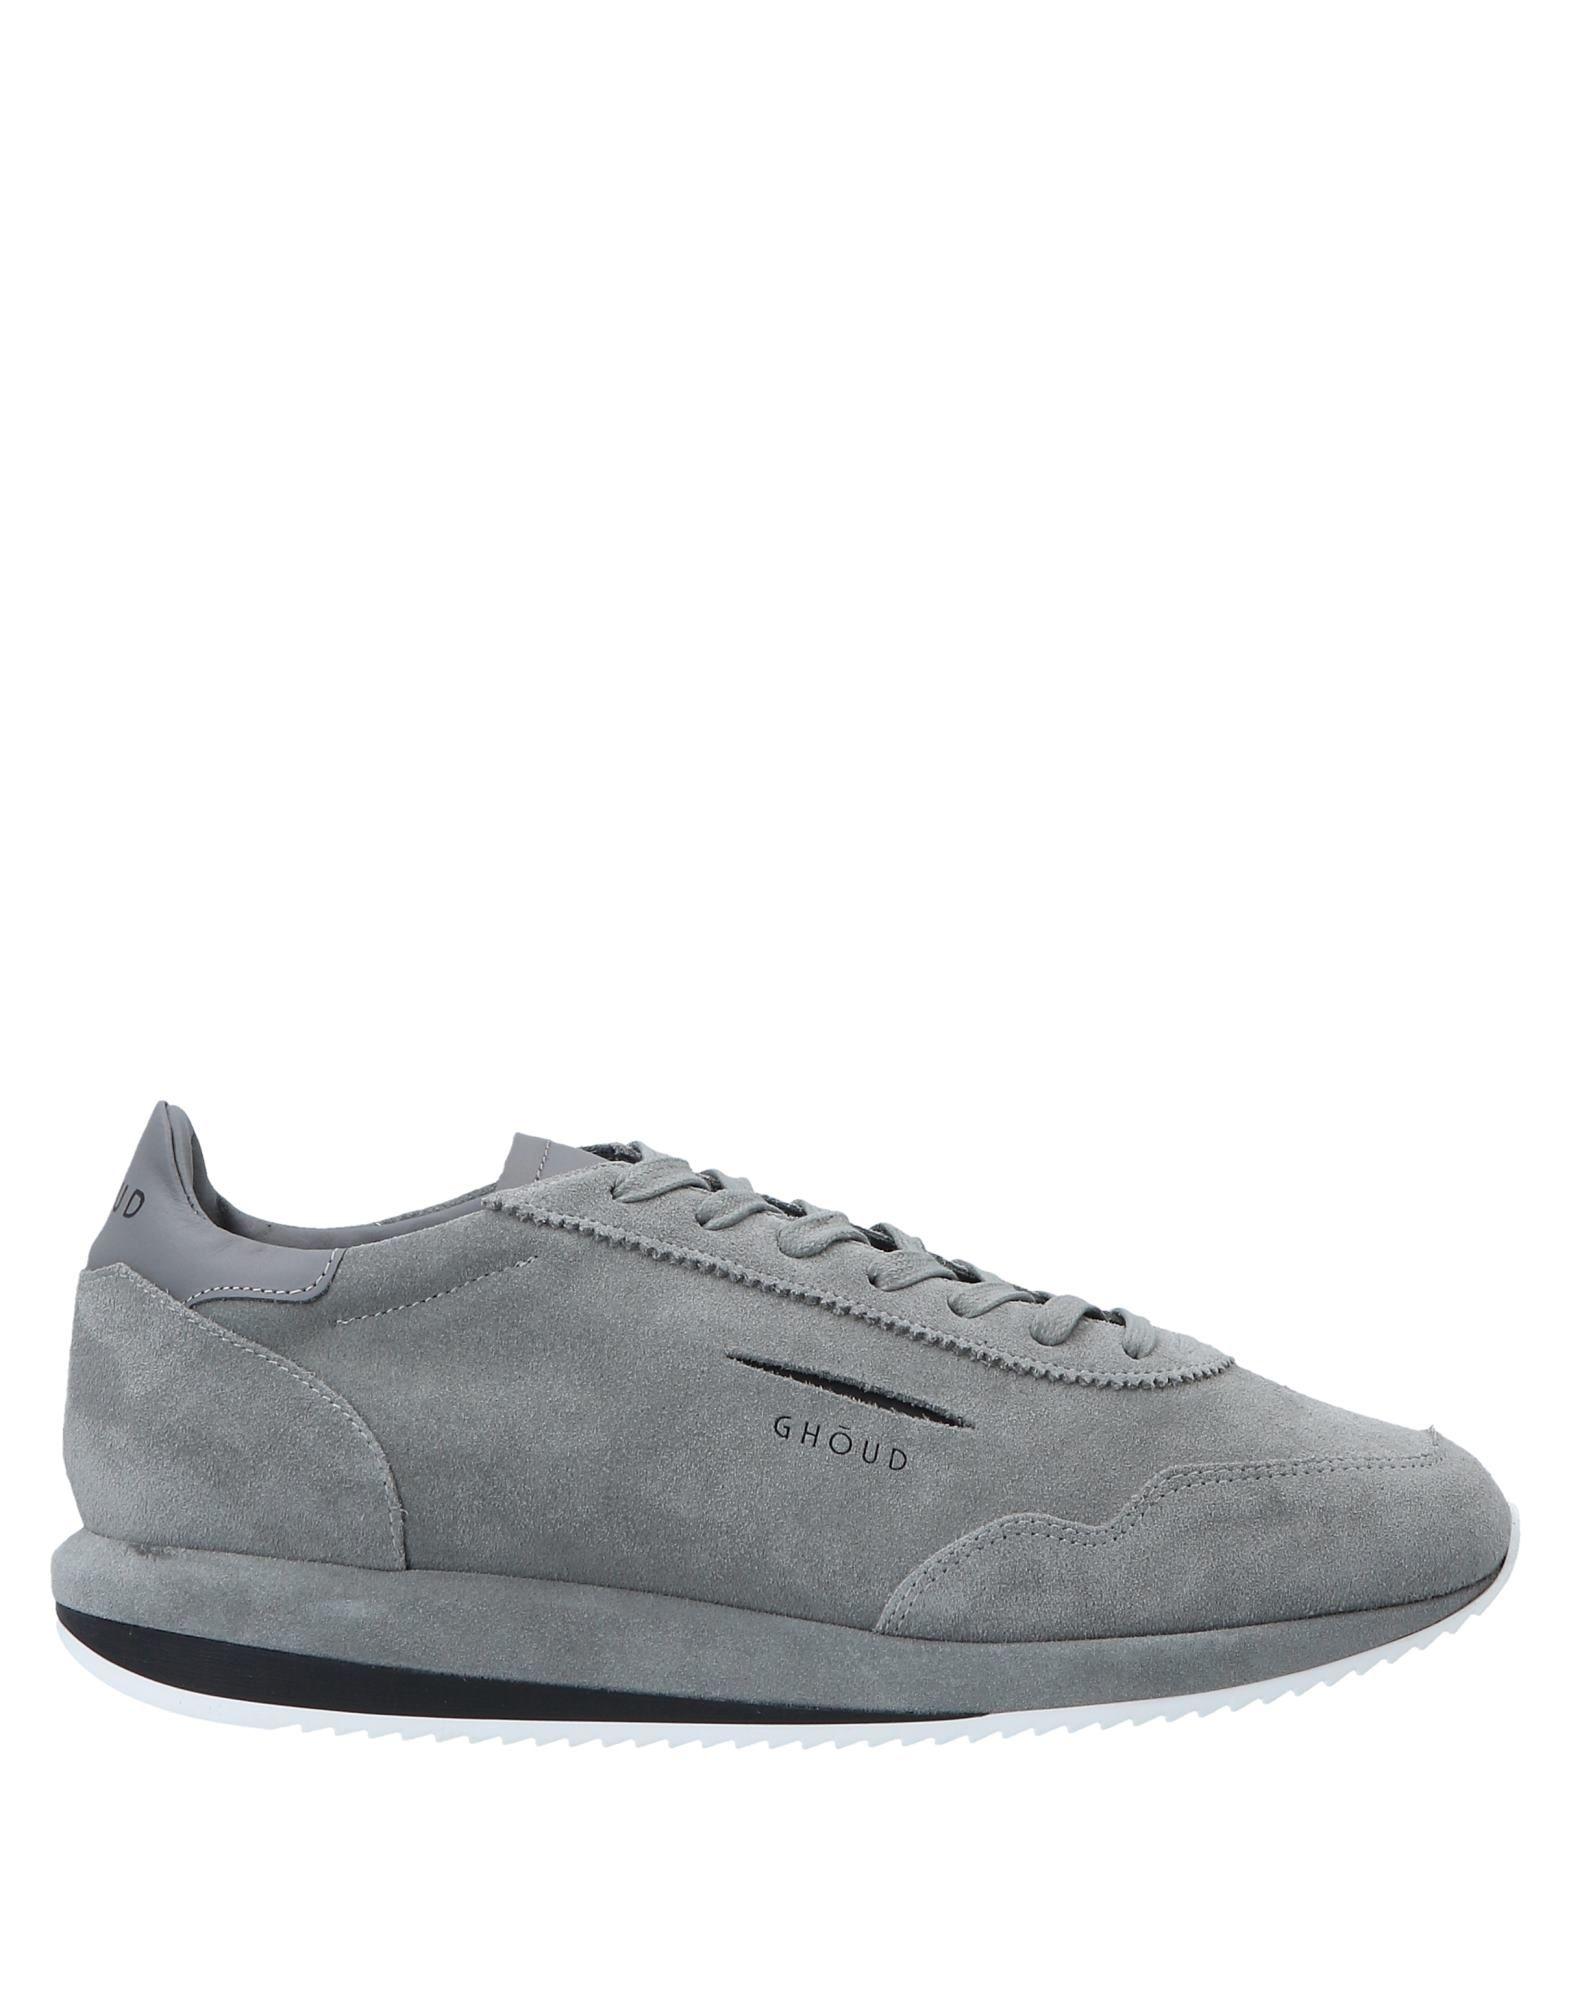 Ghōud Venice Sneakers Herren  11548873KT Gute Qualität beliebte Schuhe